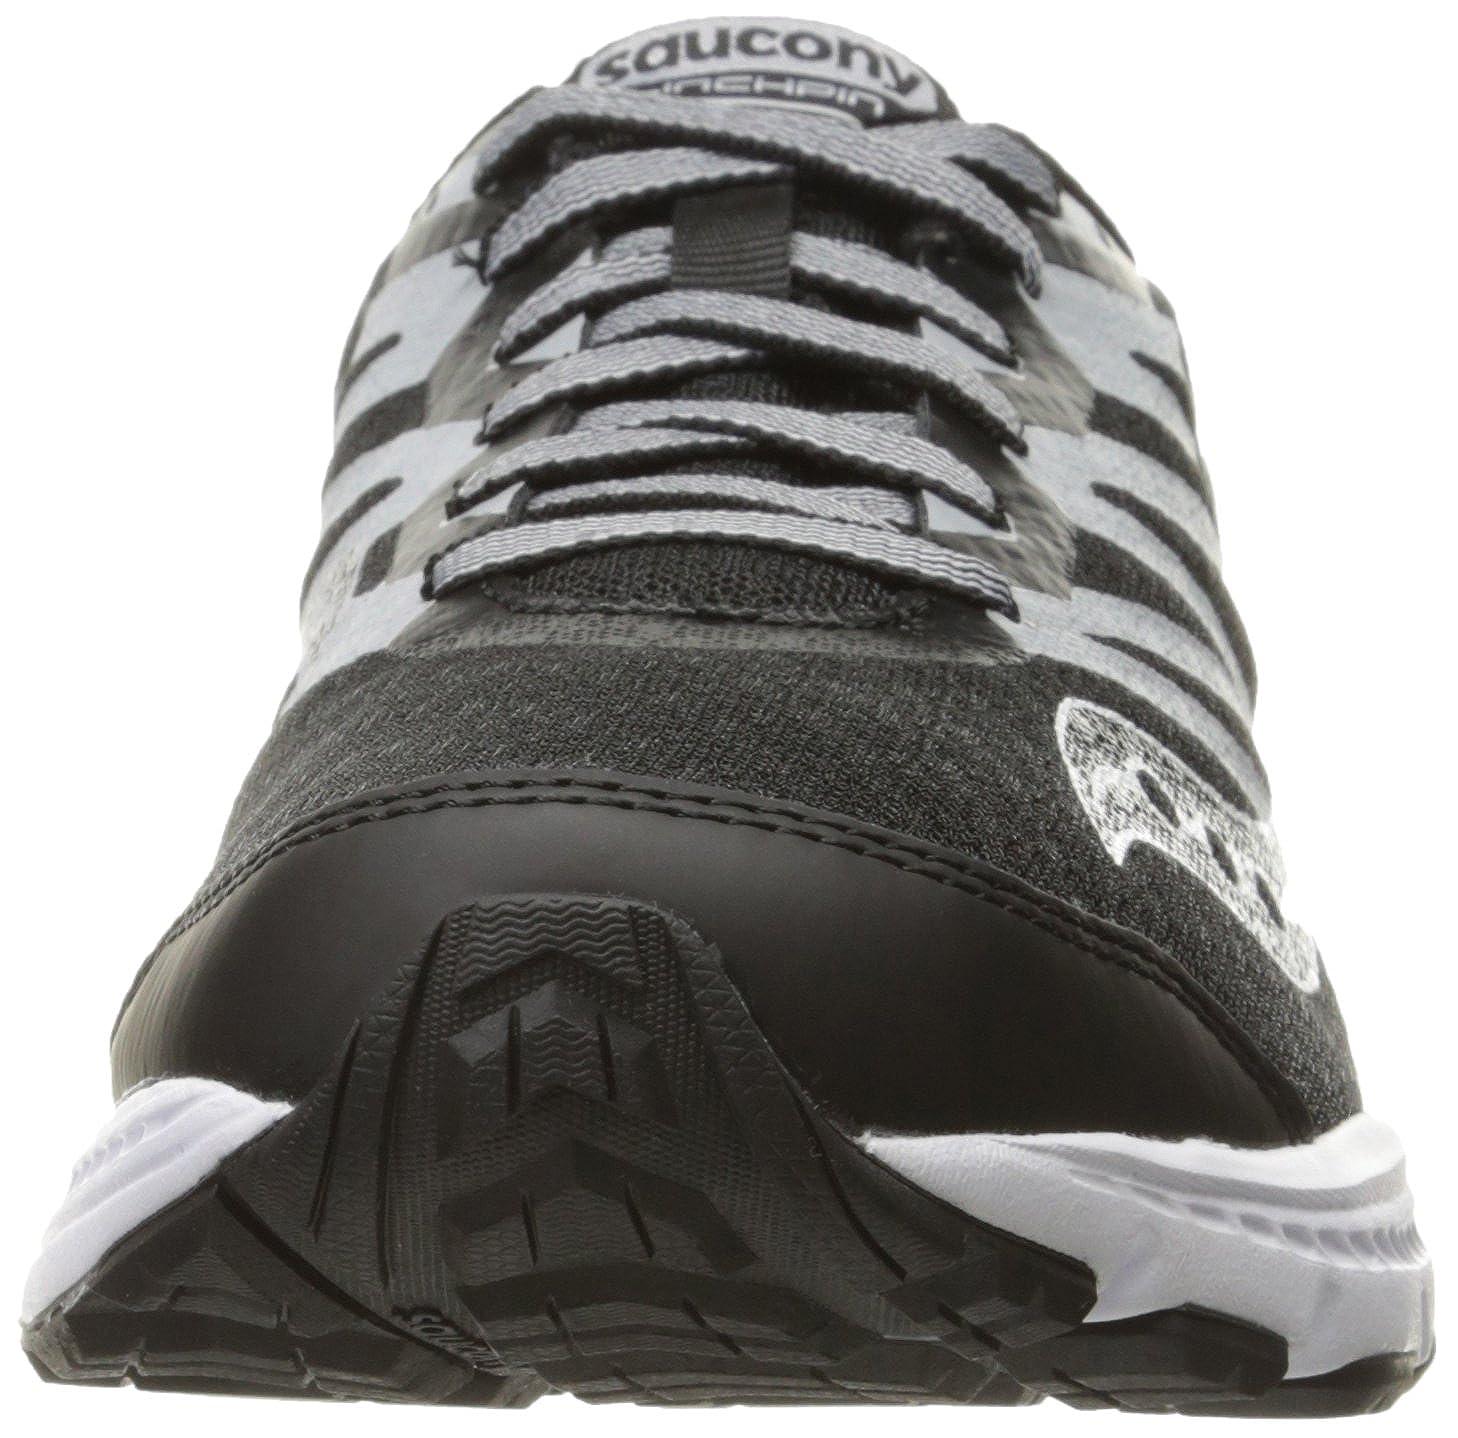 Saucony Mens Powergrid Linchpin Running Shoe